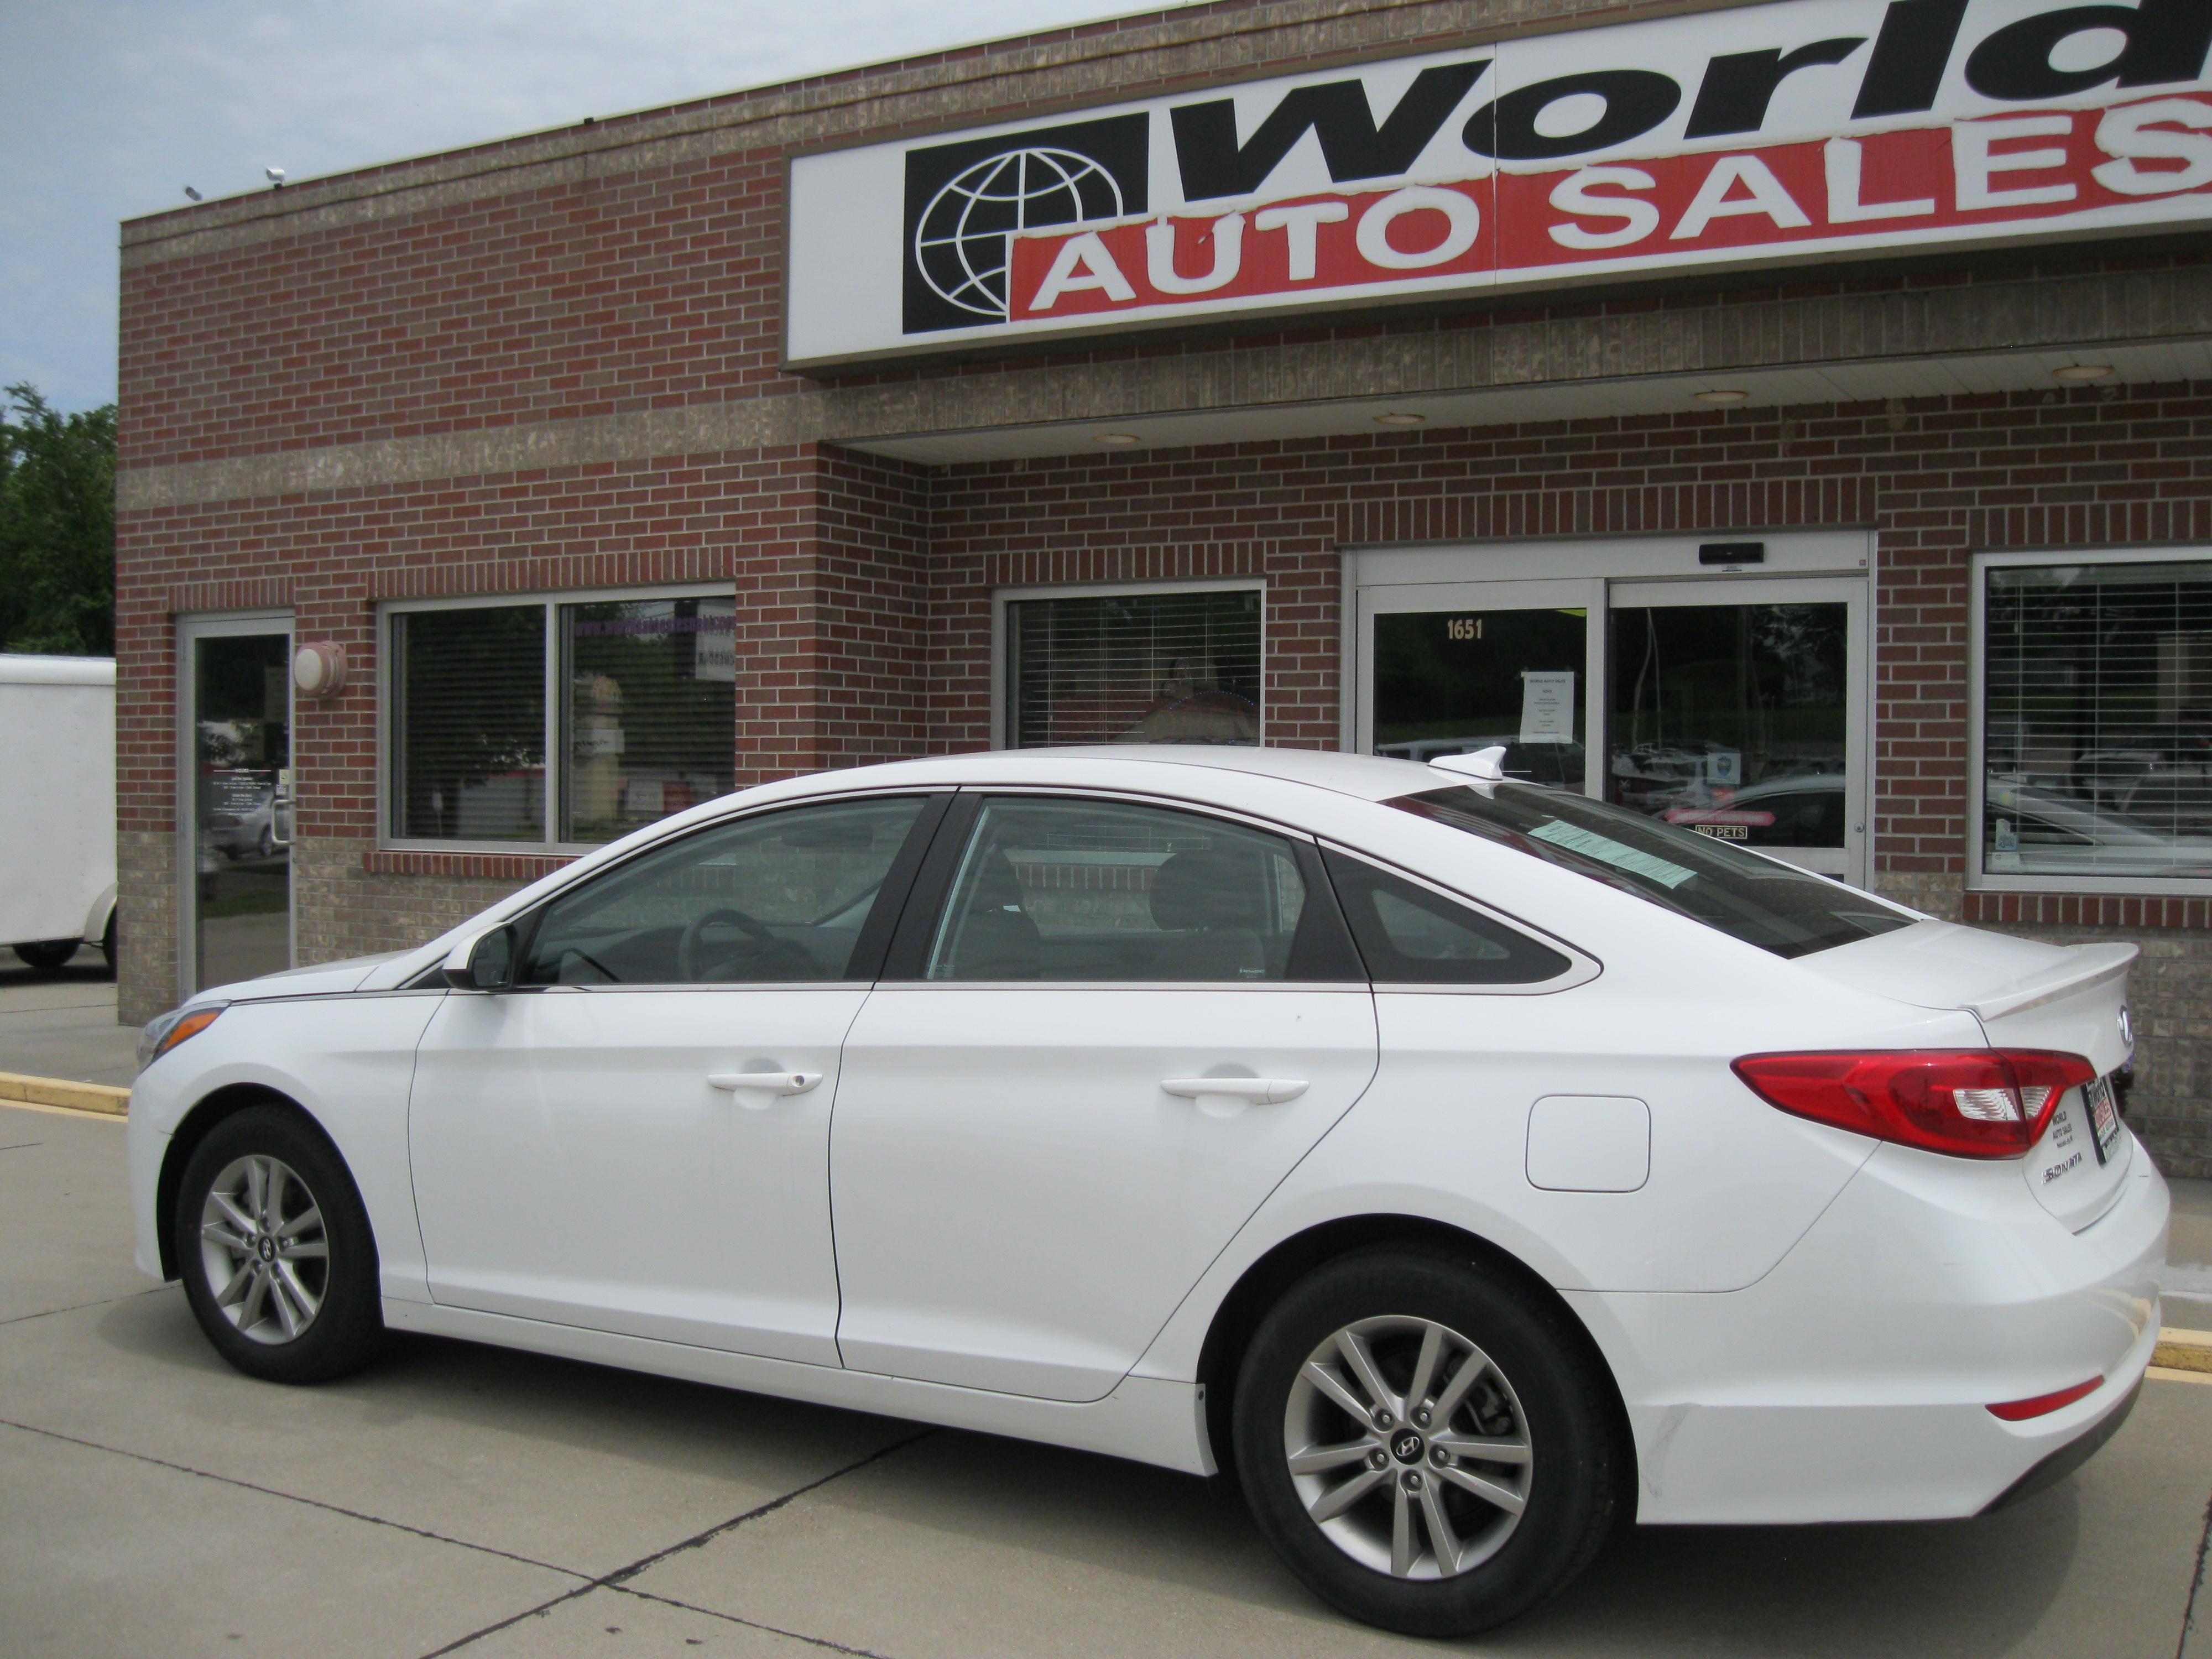 World Auto Sales image 8